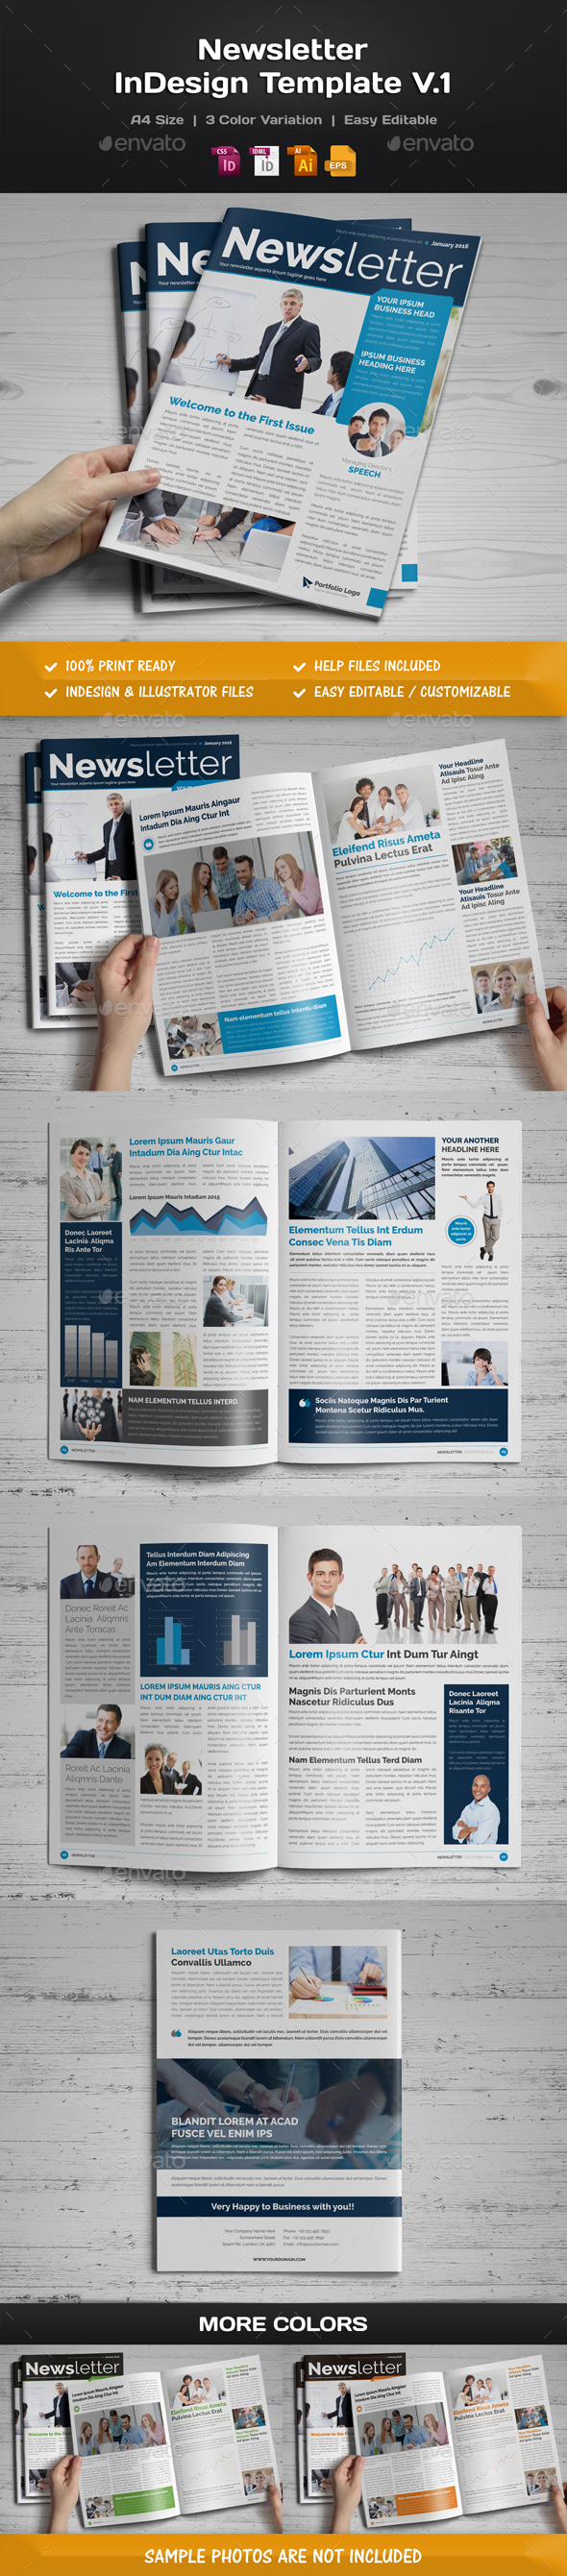 Newsletter Indesign Template v1 - Newsletters Print Templates